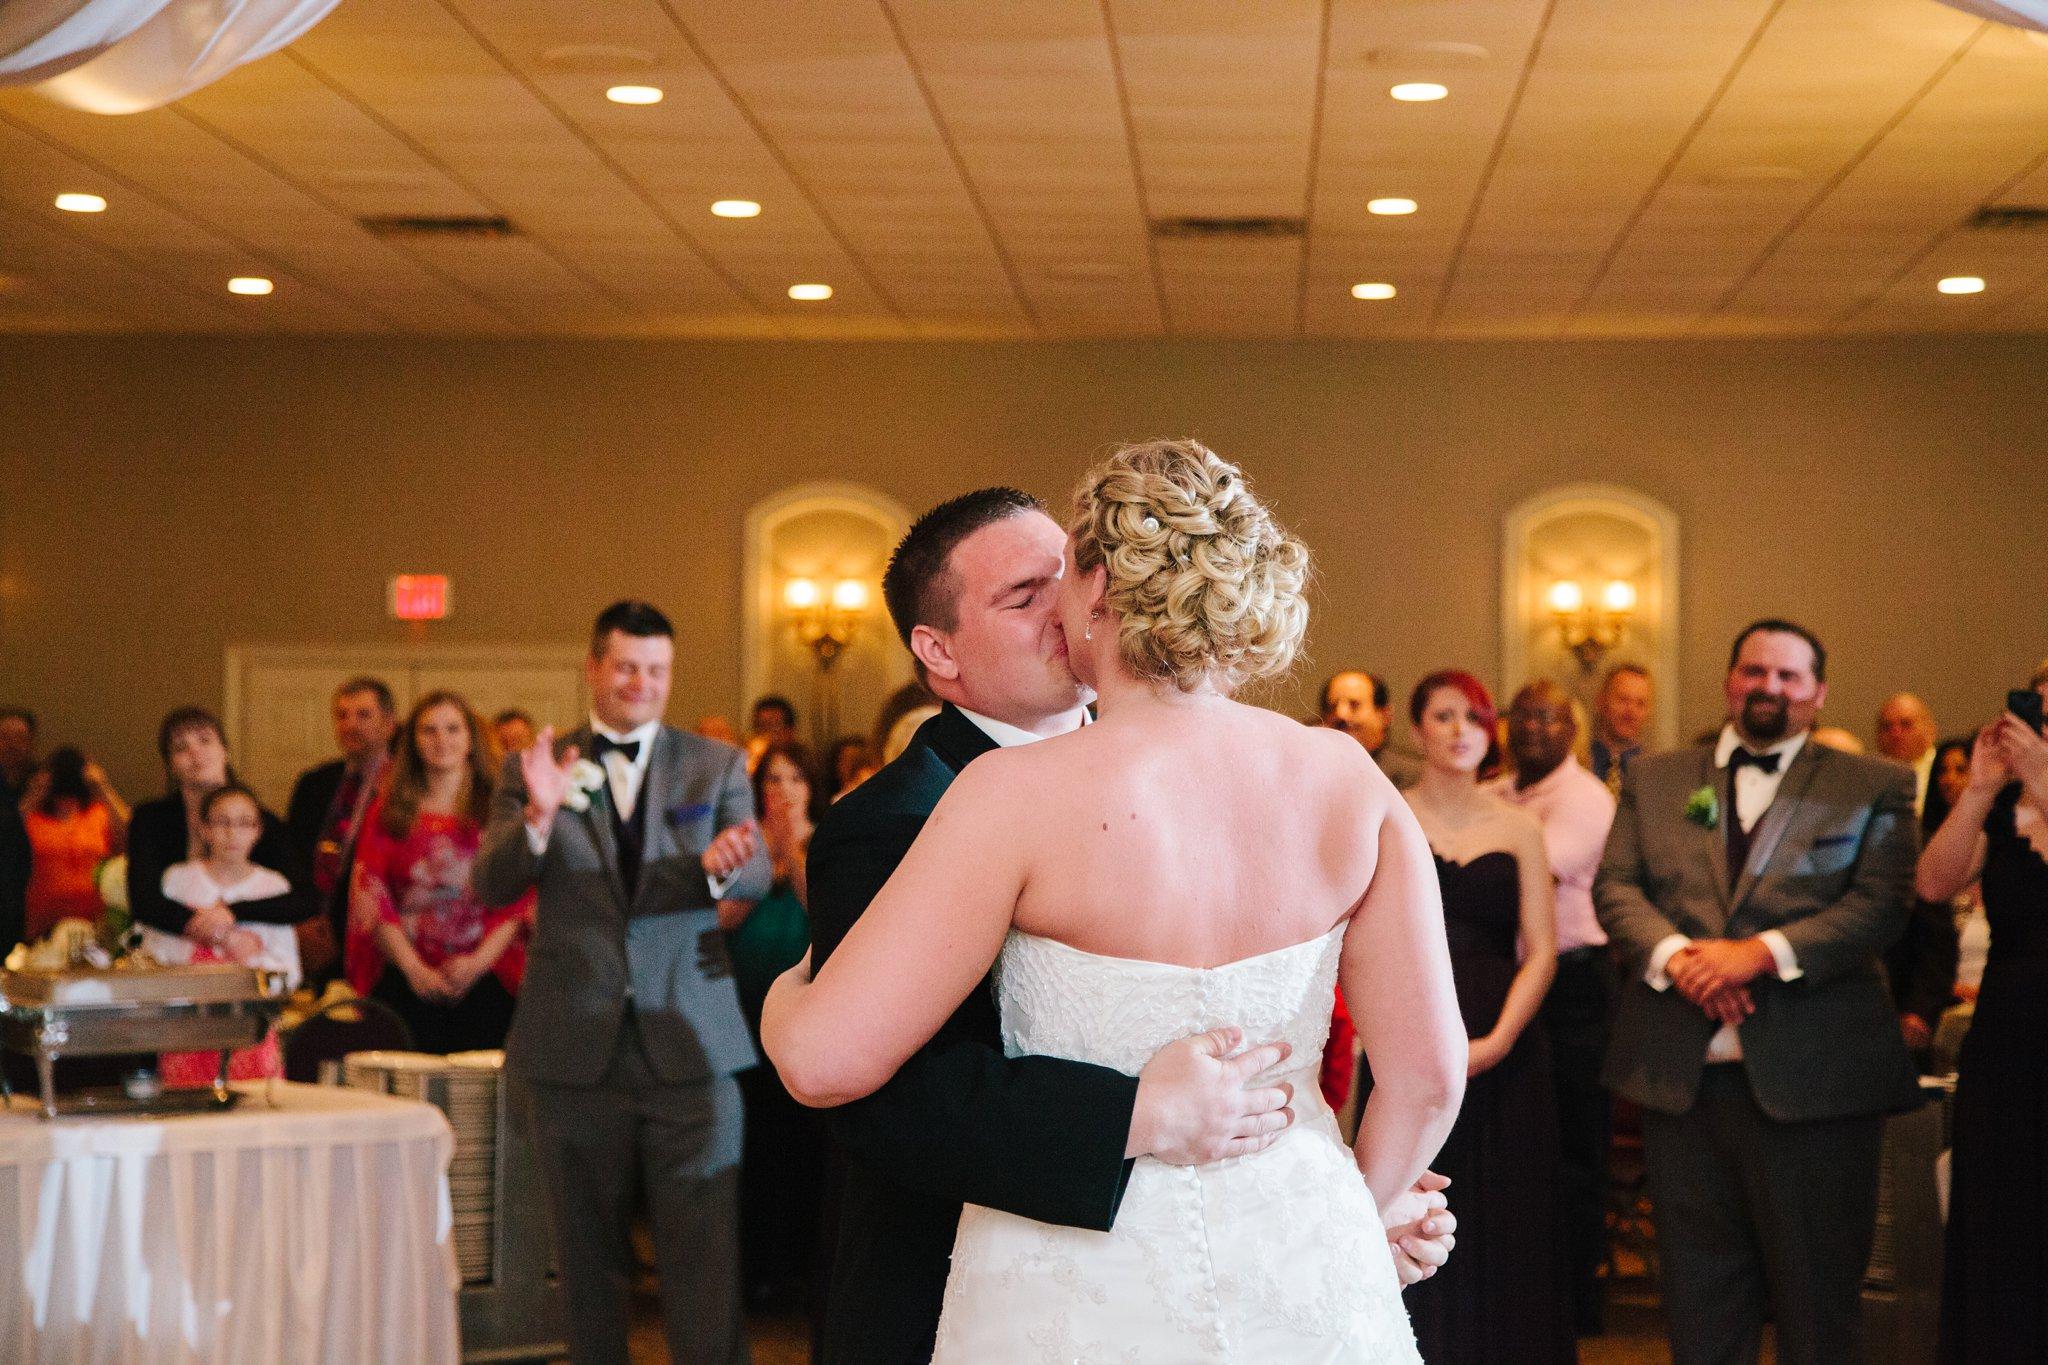 montdale_country_club_wedding_photos_photographer_scranton_pa7887.jpg